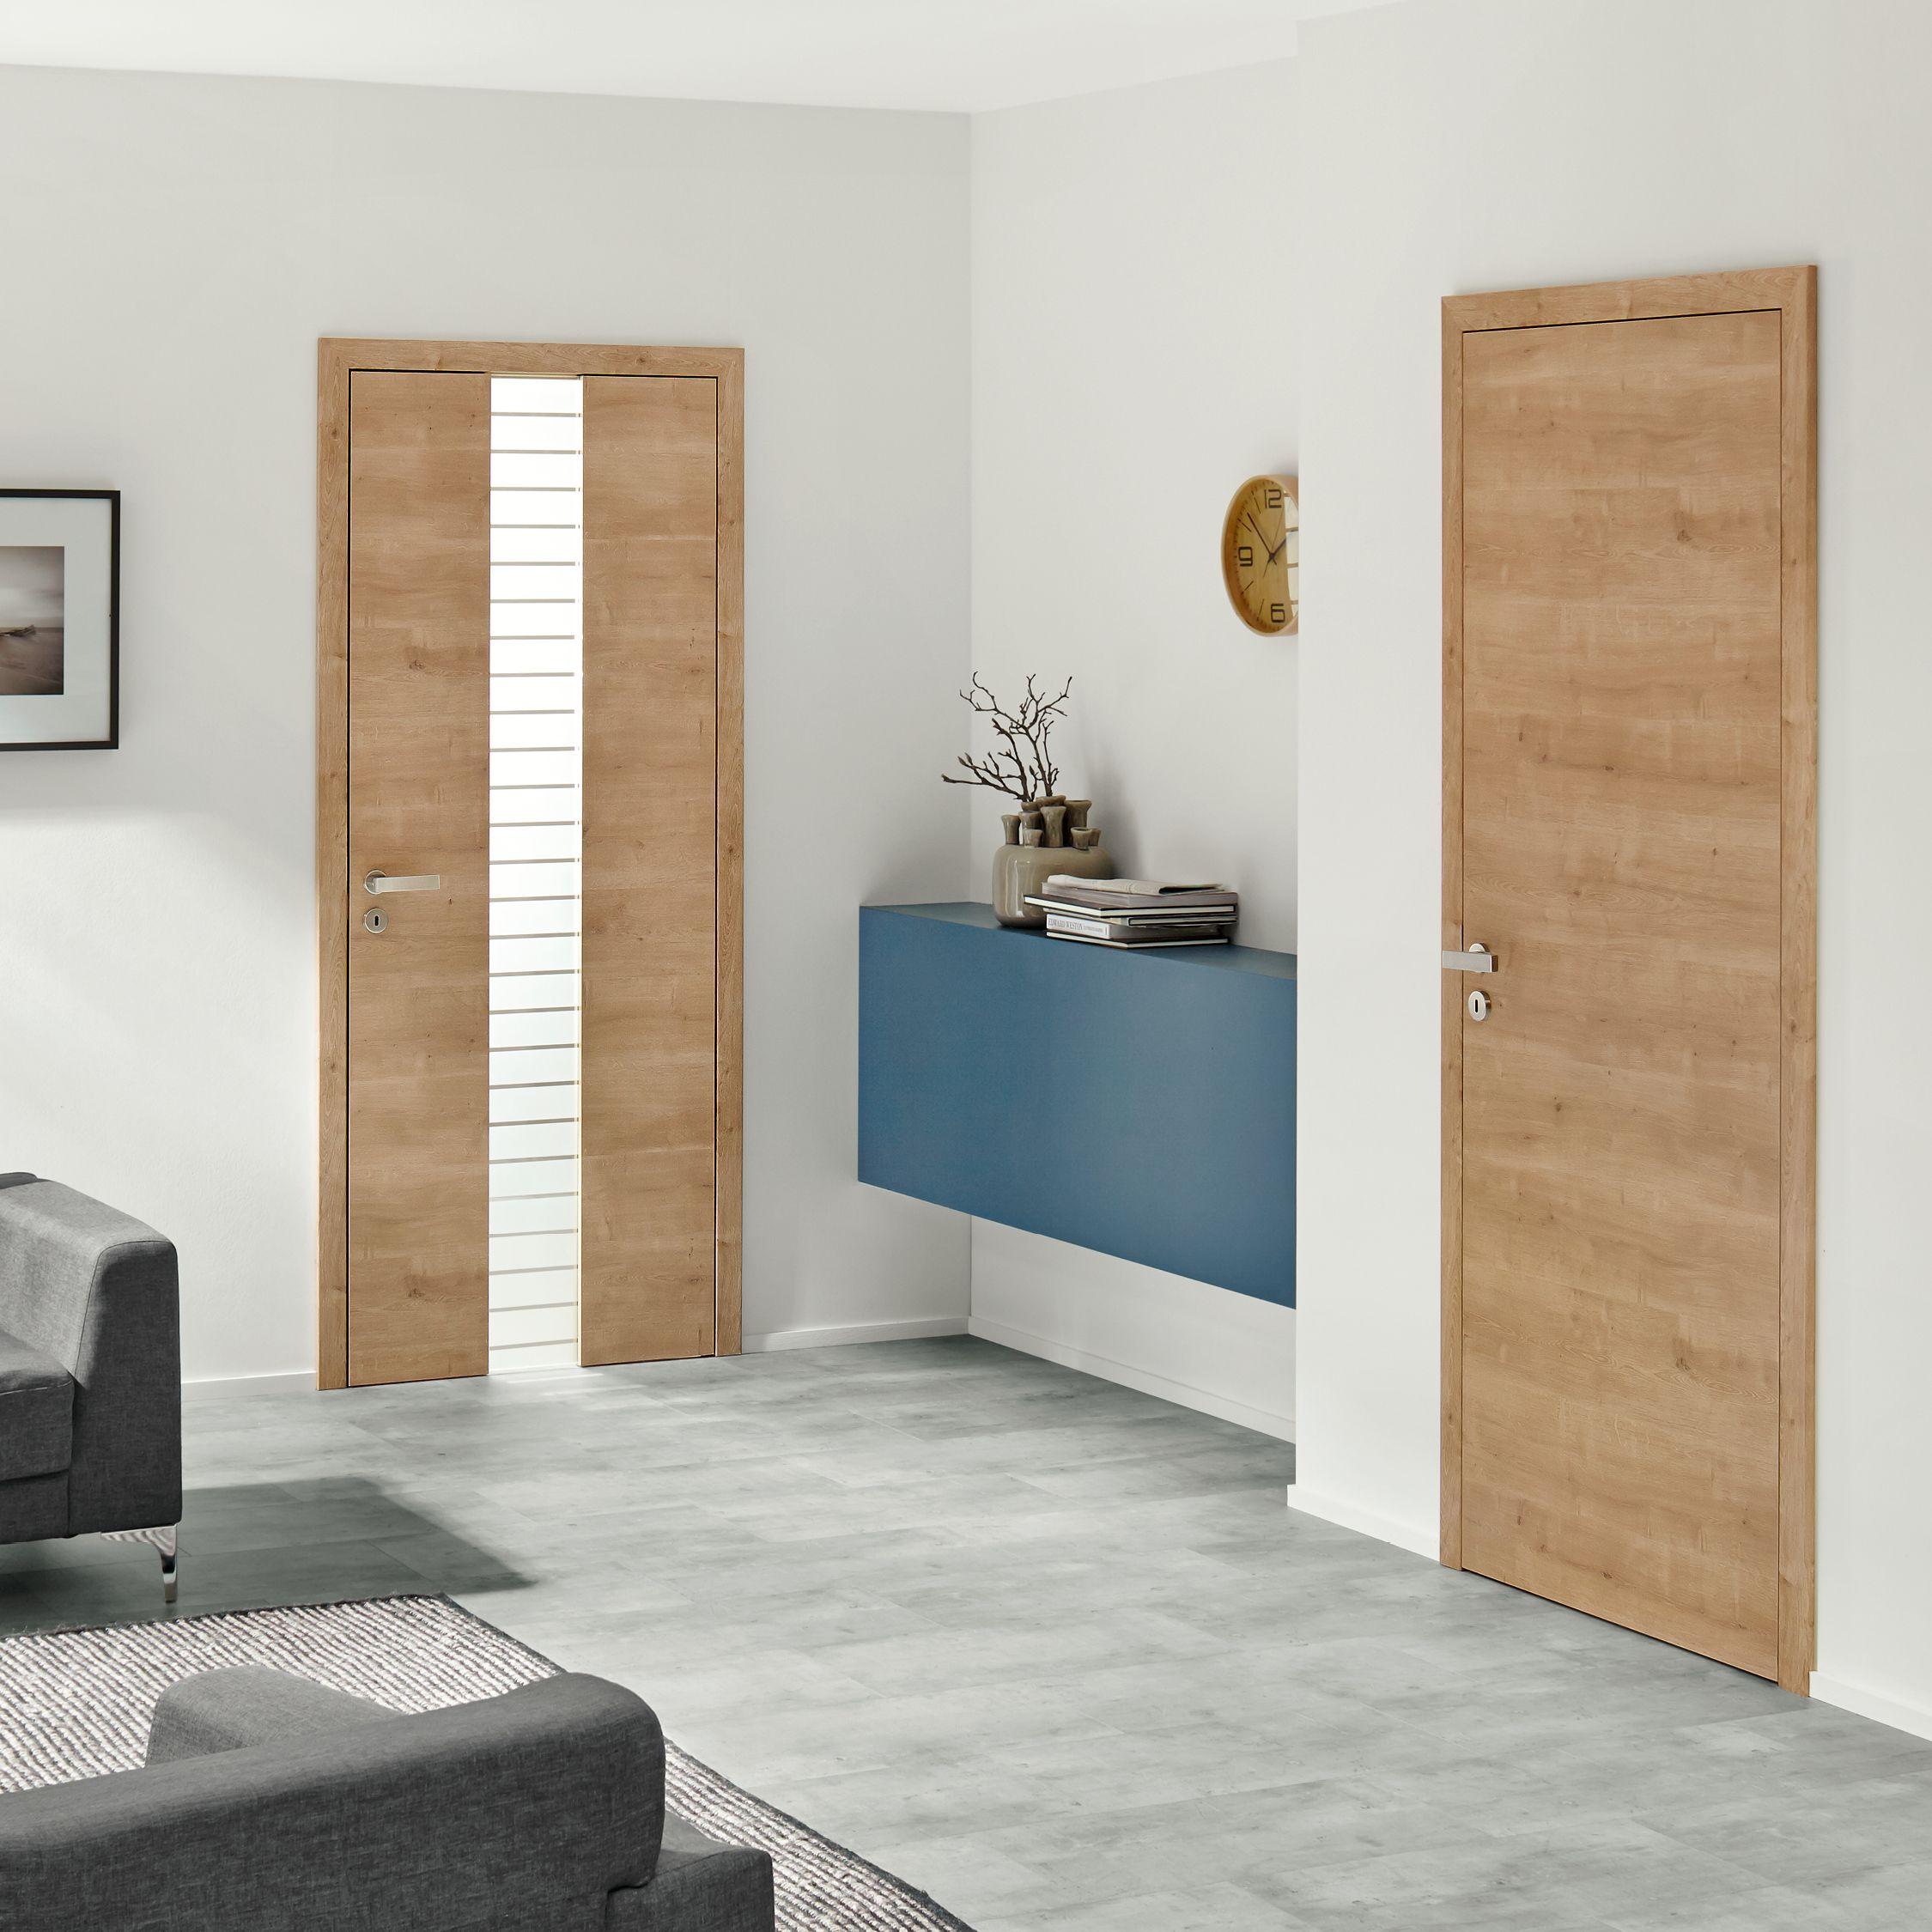 Holztüren für den Frühling